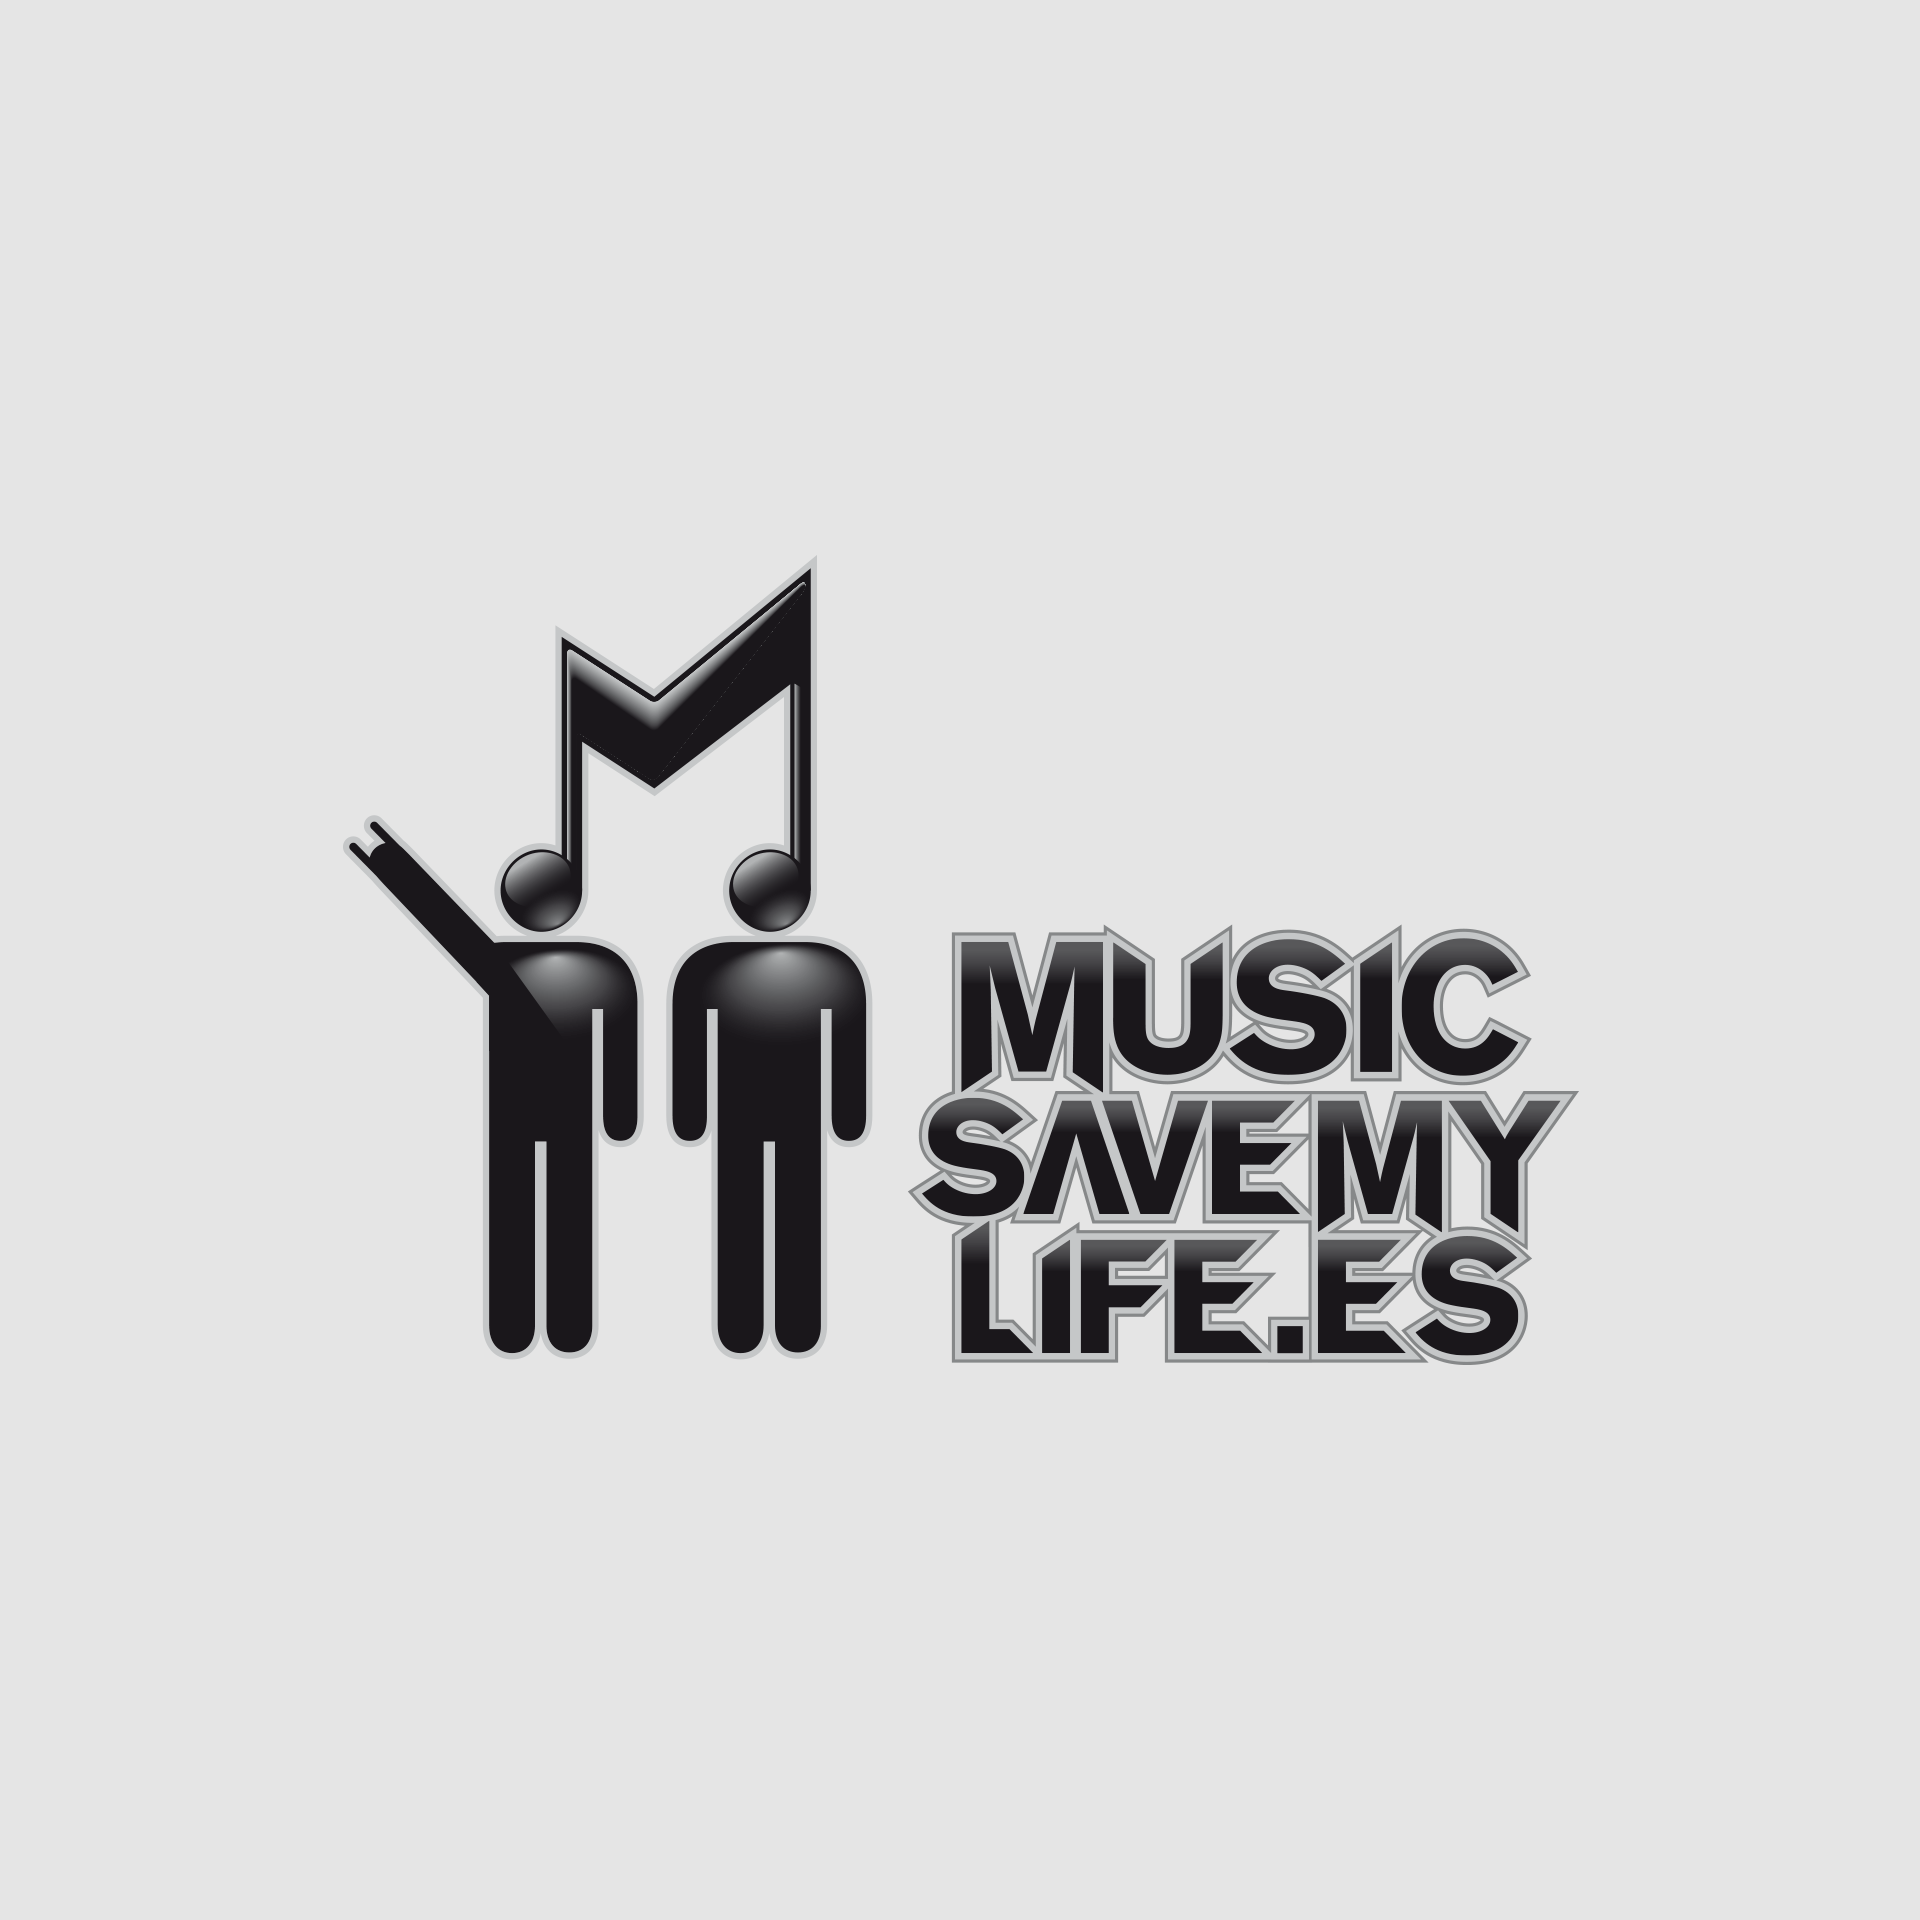 diseño logotipo music save my life